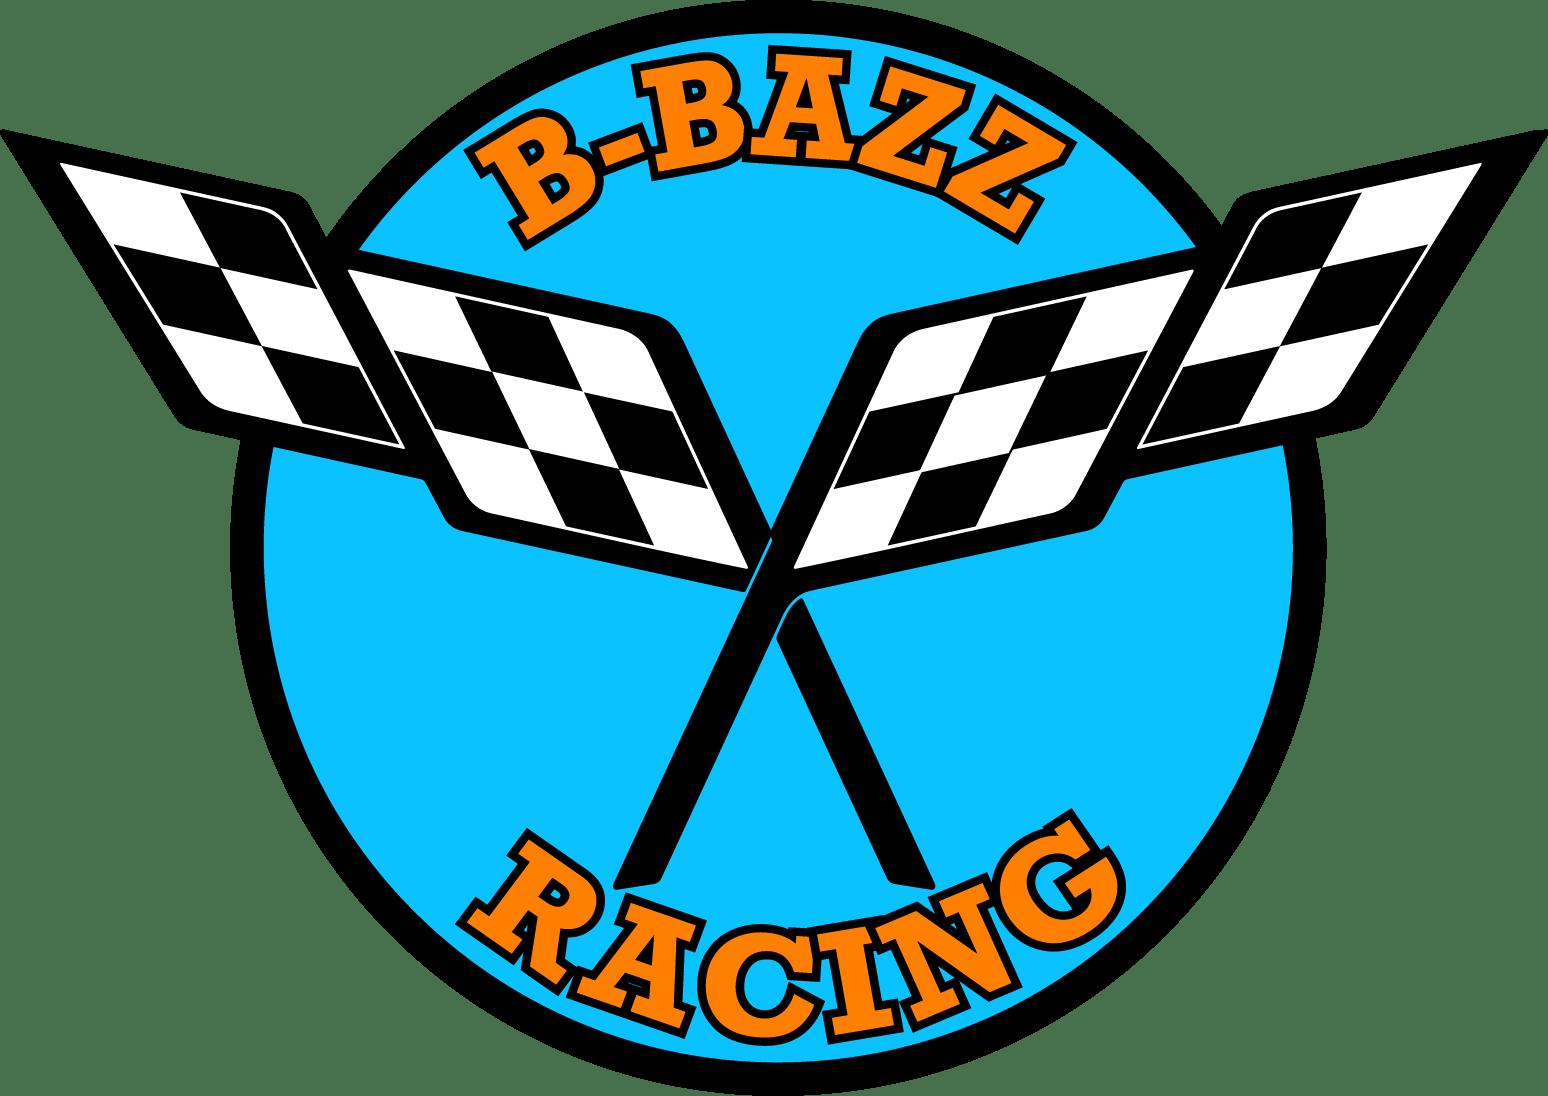 B-Bazz bbazz racing logo with Anguilla Colors